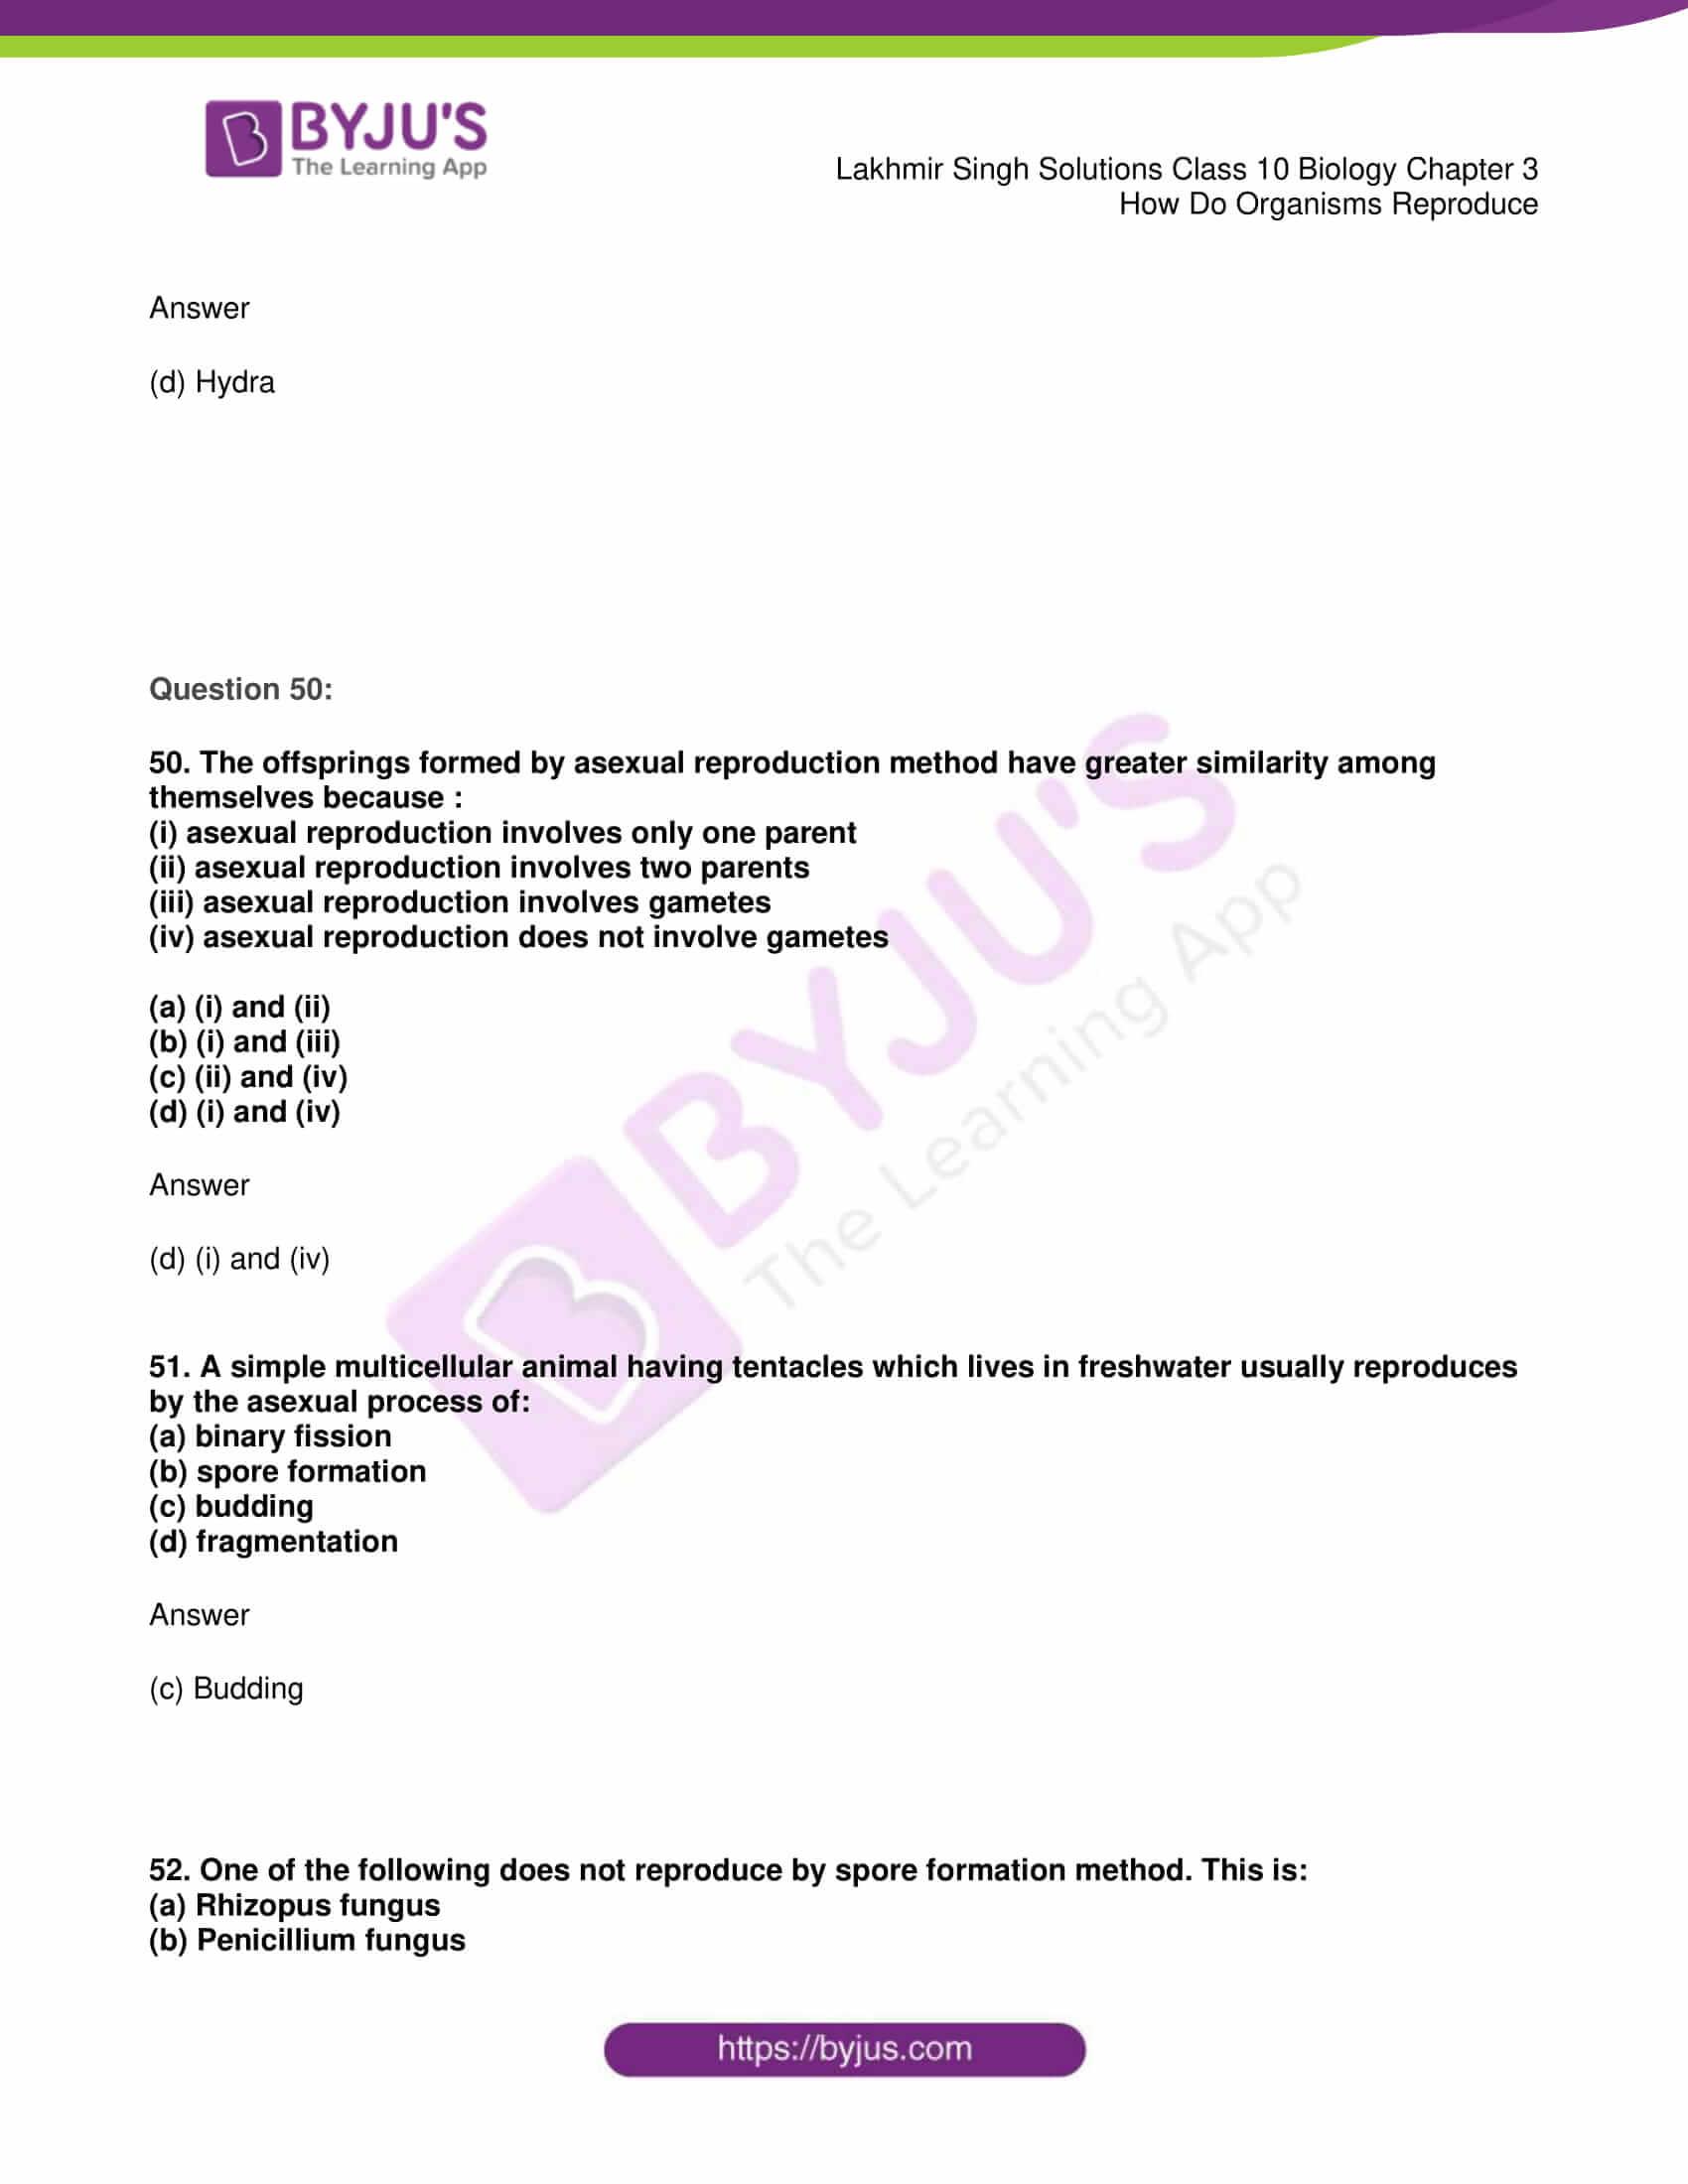 lakhmir singh solutions class 10 biology chapter 3 19